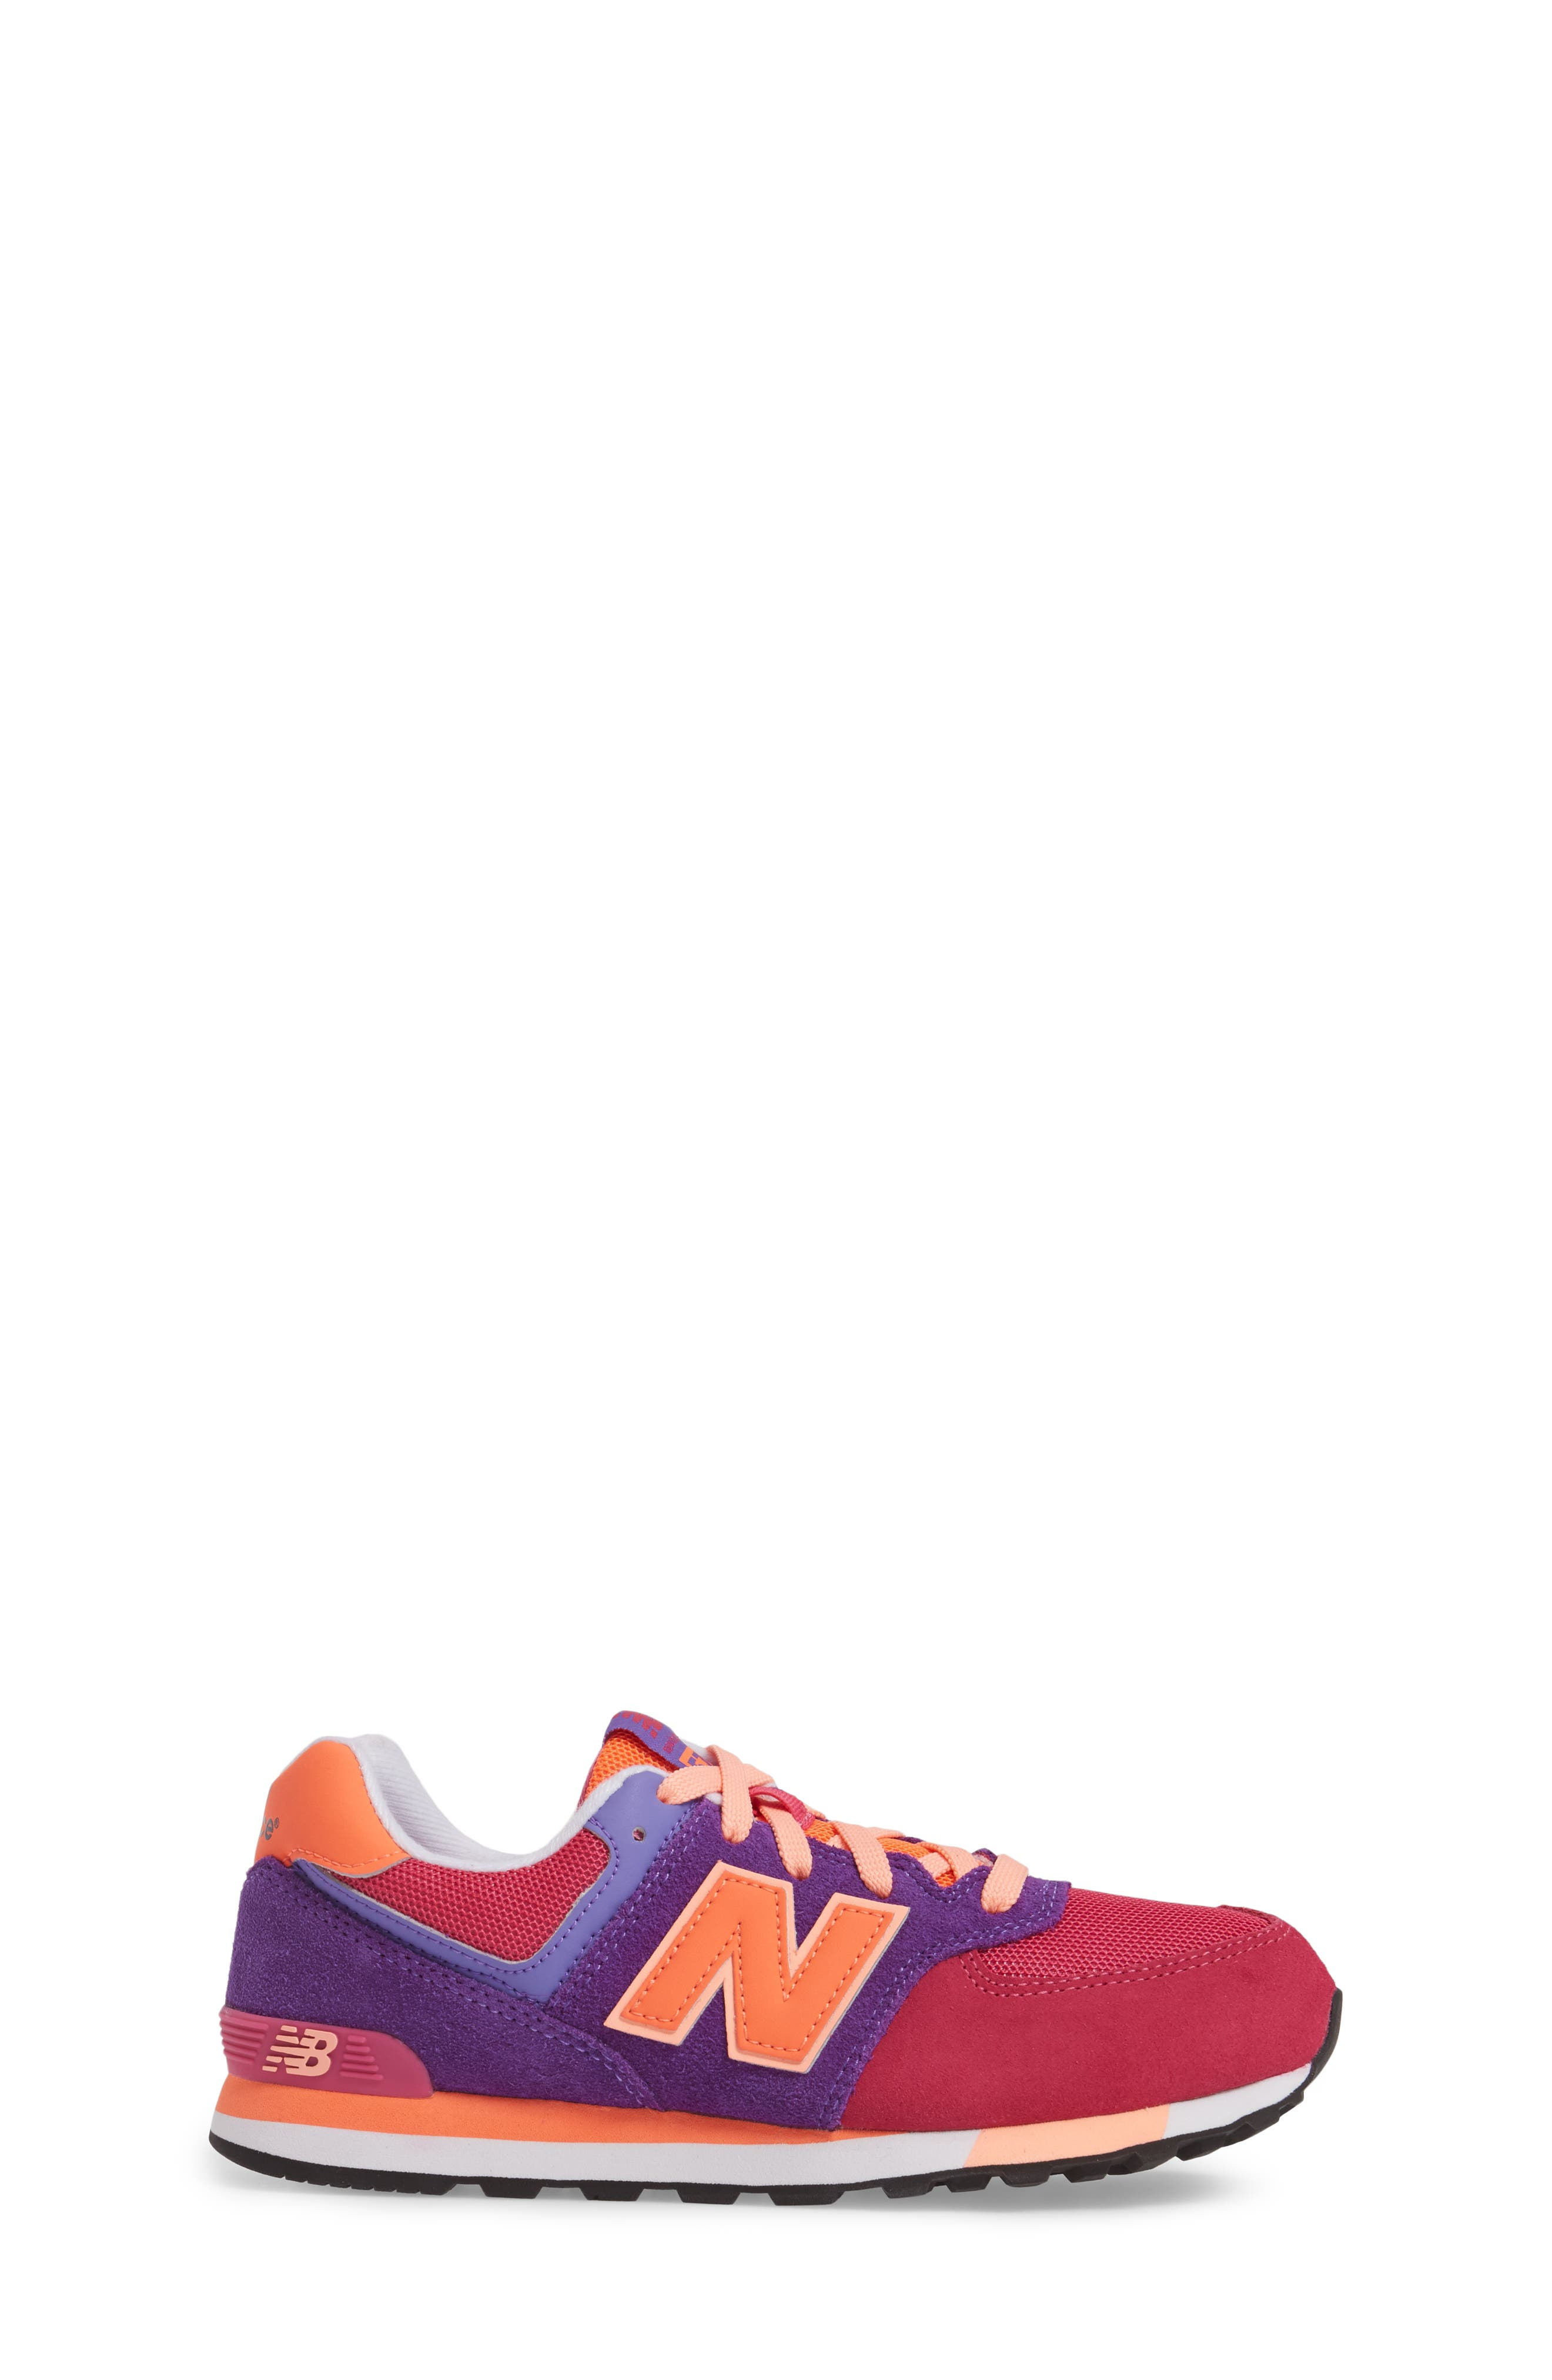 574 Cut & Paste Sneaker,                             Alternate thumbnail 3, color,                             655